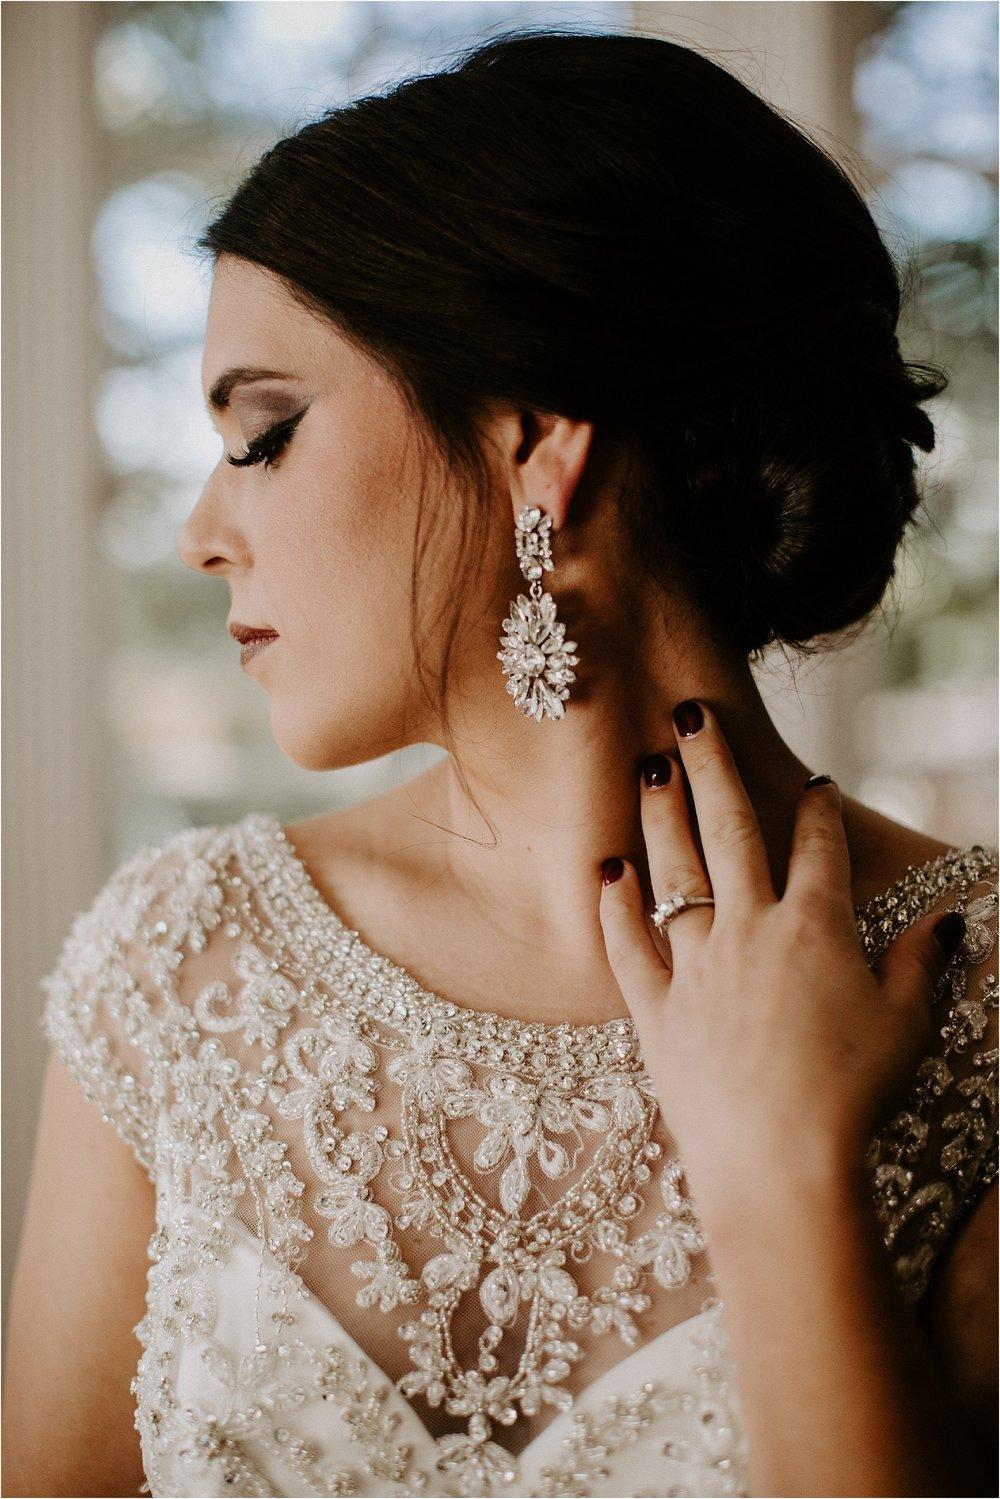 Sarah_Brookhart_Philadelphia_Wedding_Photographer_0014.jpg